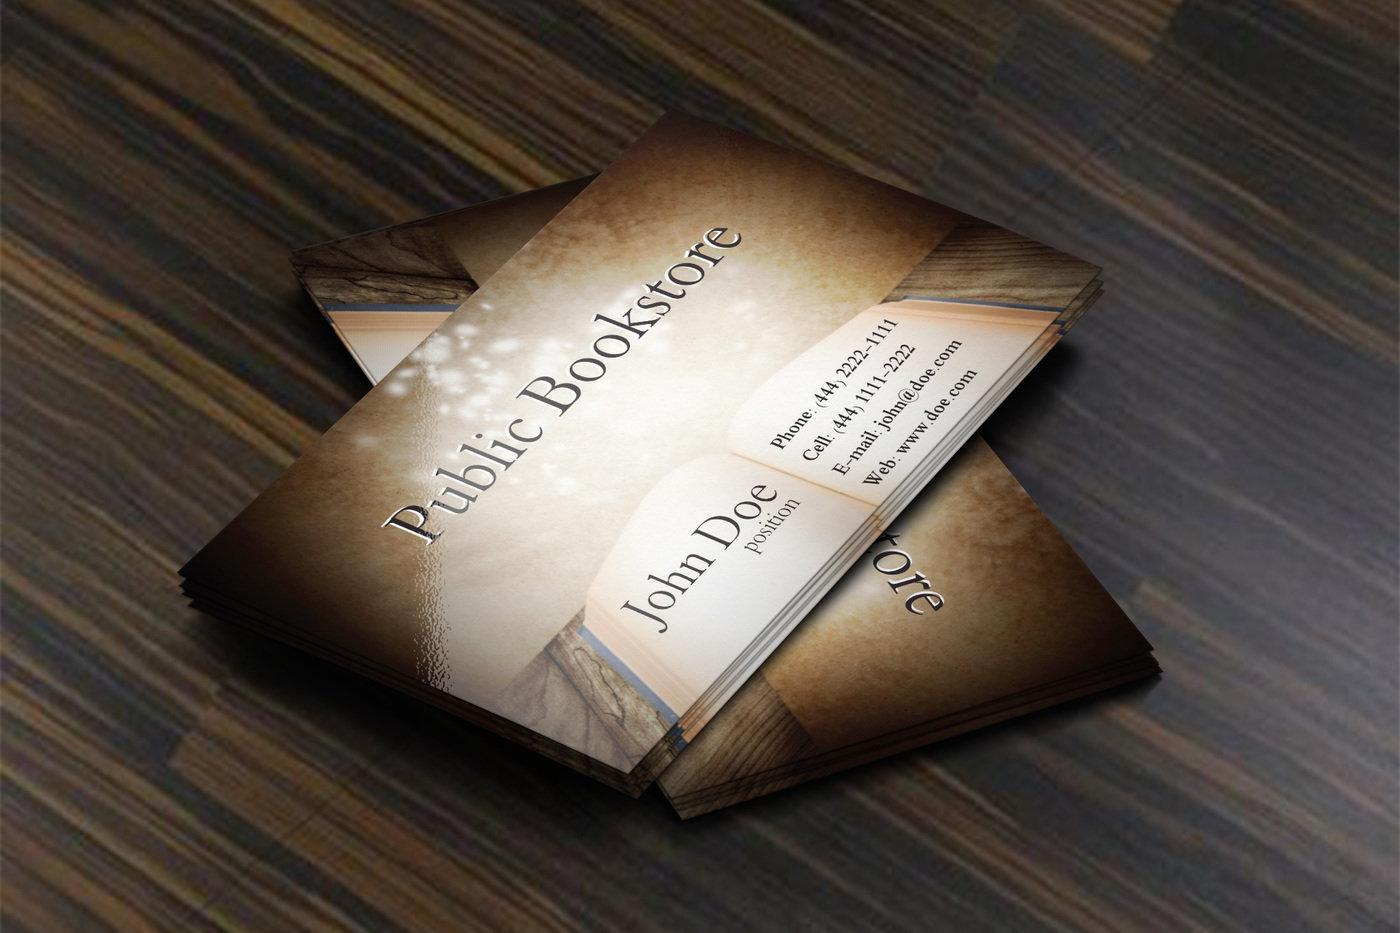 Free bookstore business card template by borce markoski at coroflot share reheart Gallery